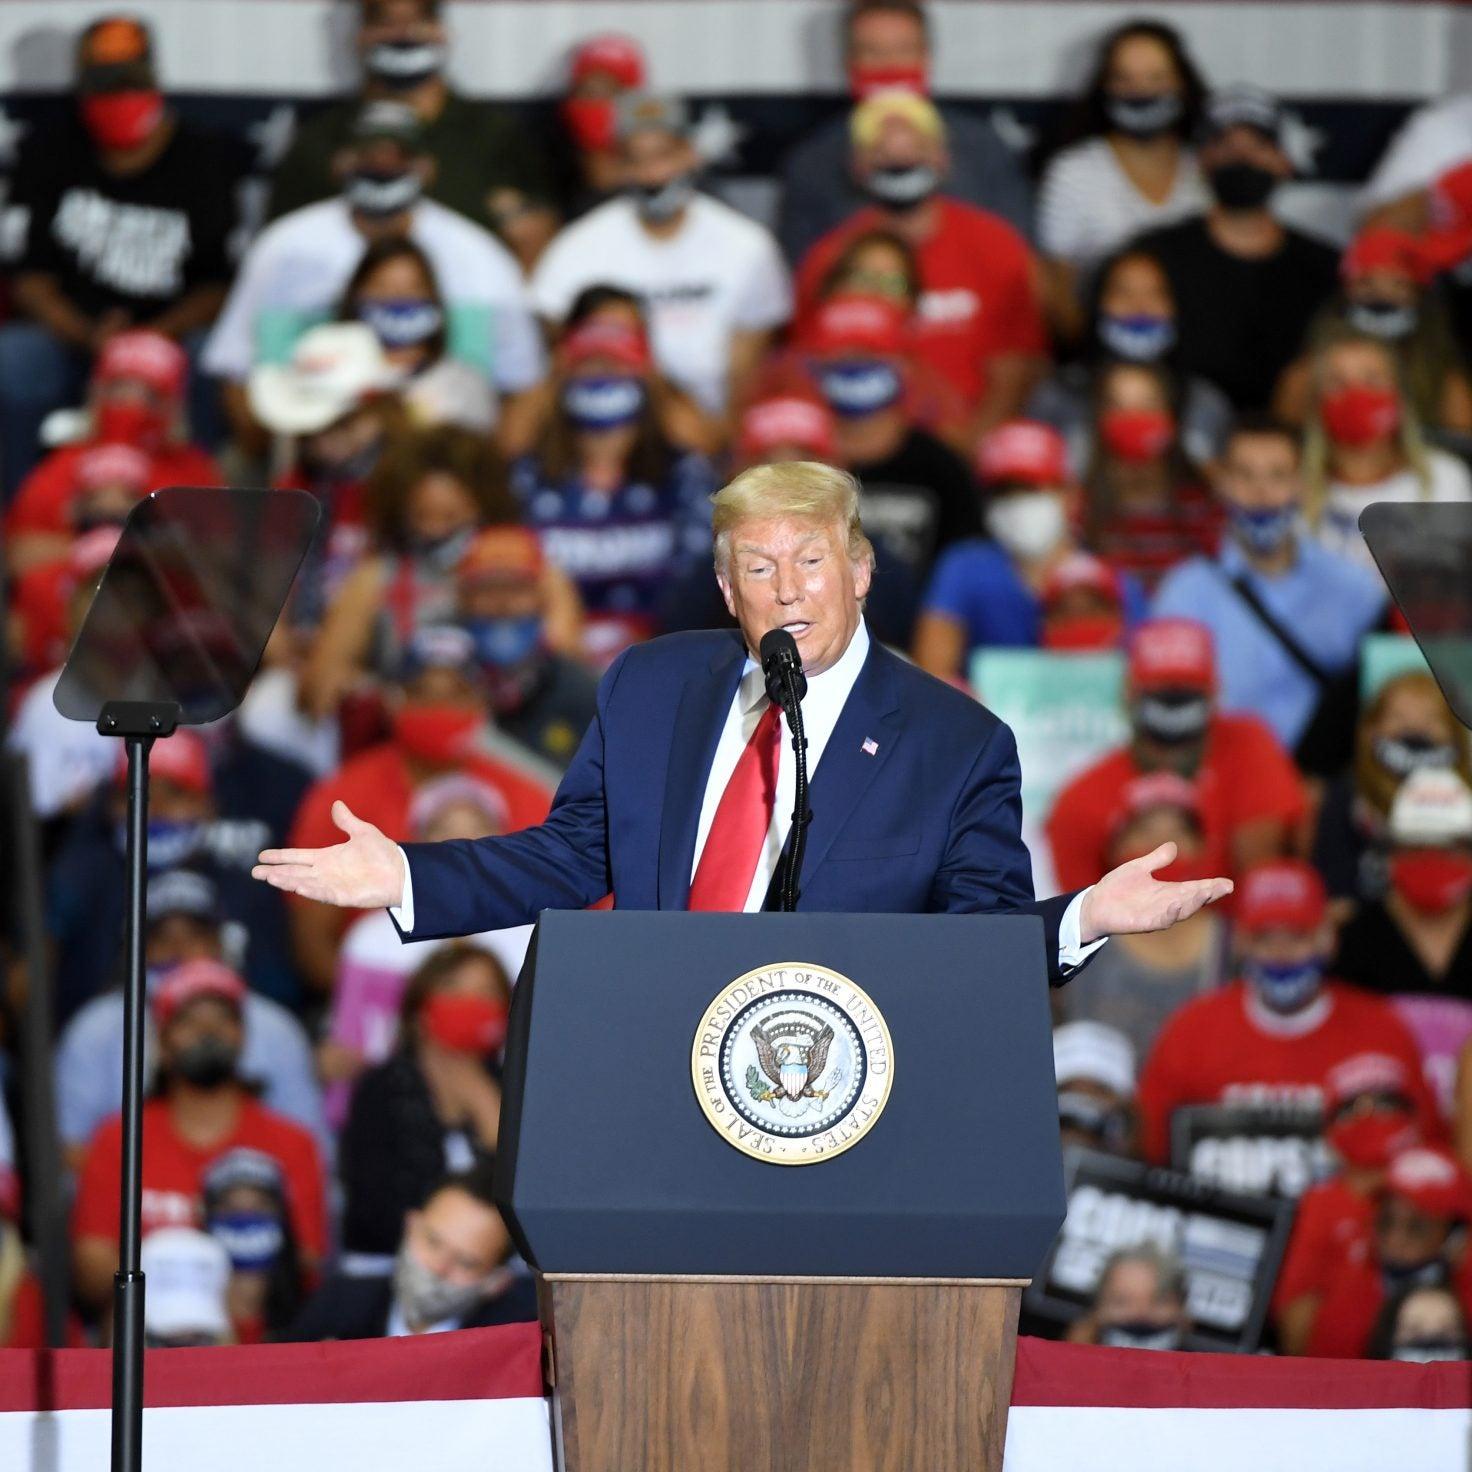 Nevada Gov. Steve Sisolak Slams Trump For Hosting Campaign Rally Indoors